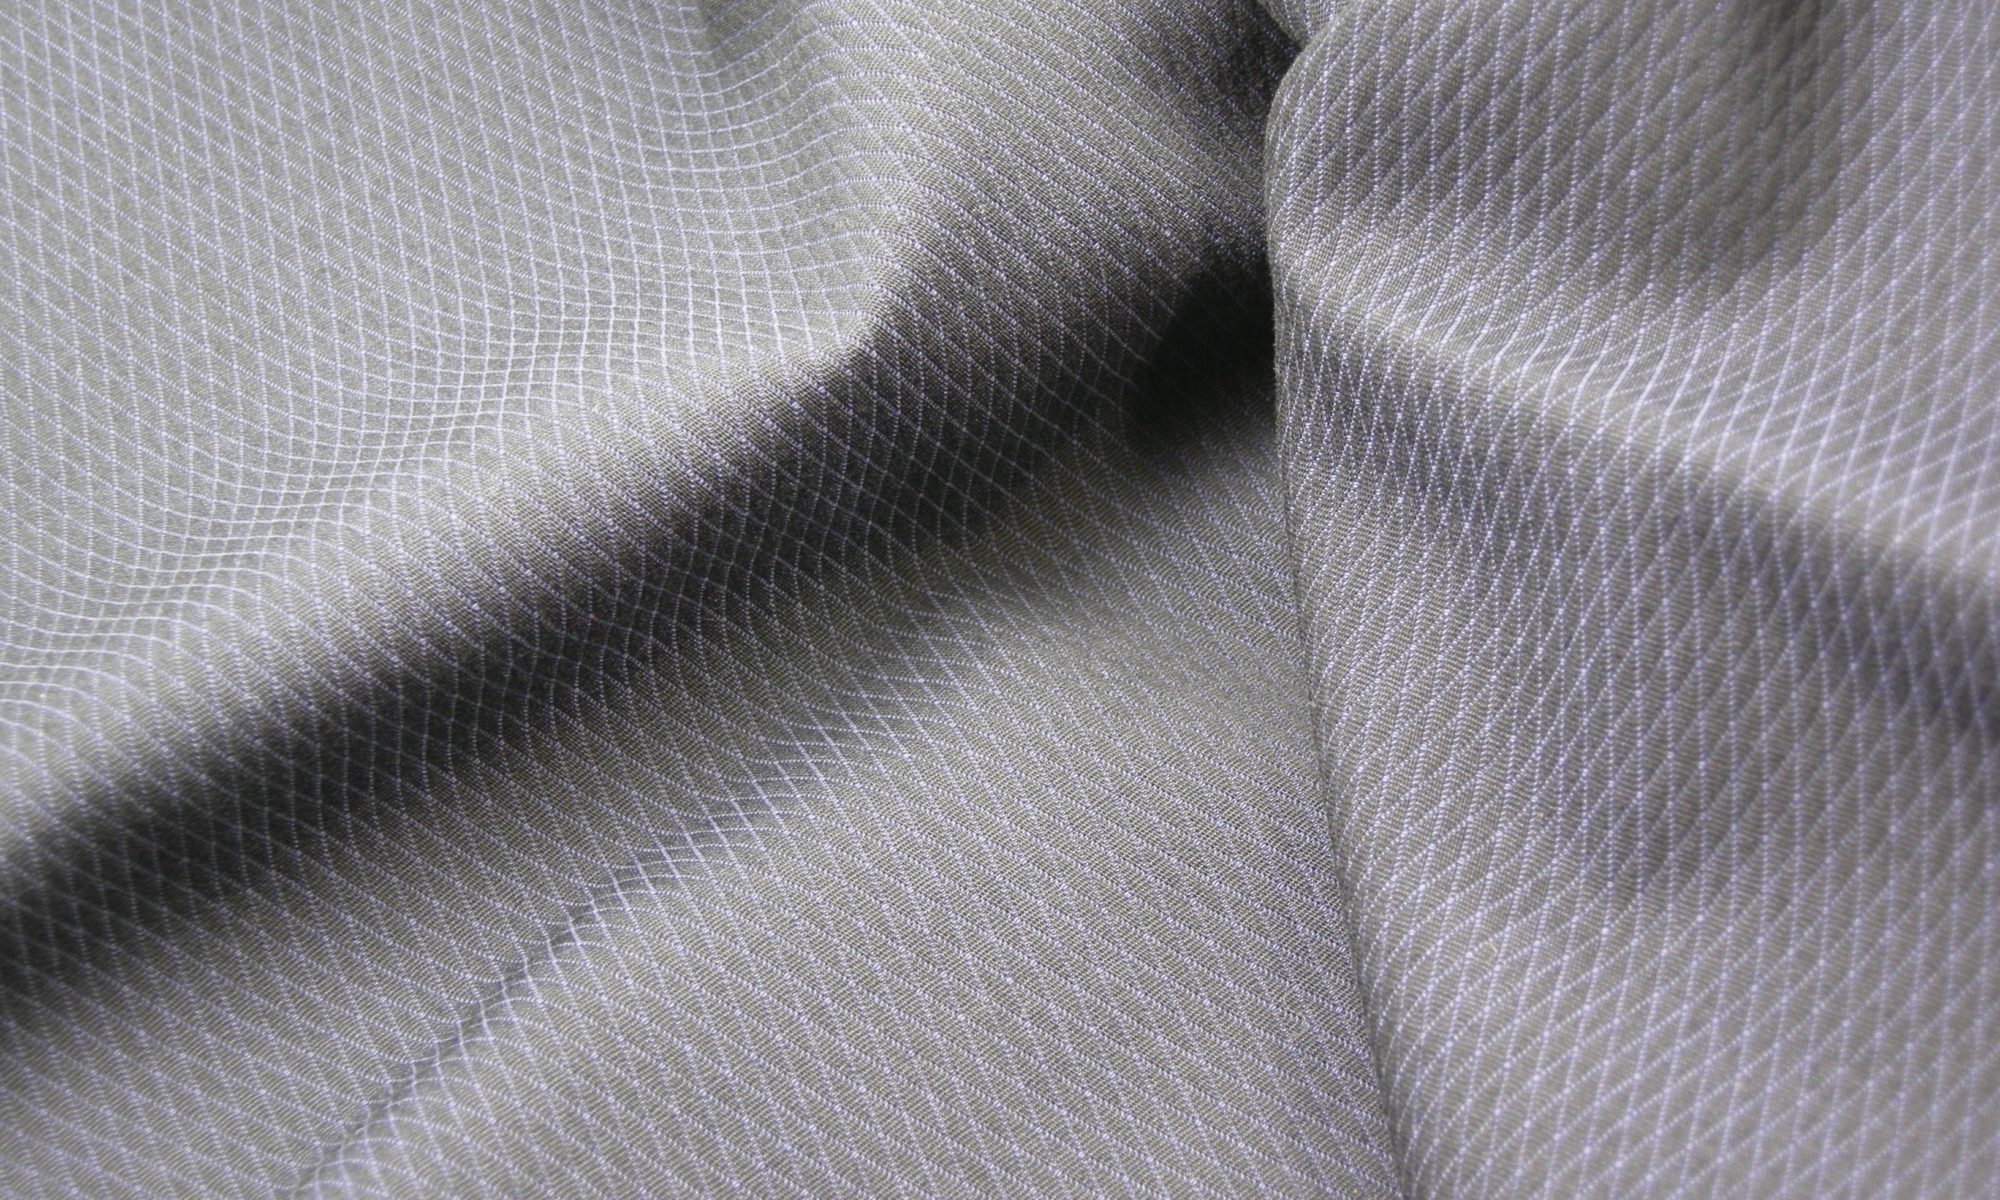 ART 7207 rhombus weave cotton jacket fashion fabric WIDTH cm150 WEIGHT gr240 COMPOSITION 100 cotton - 200mts